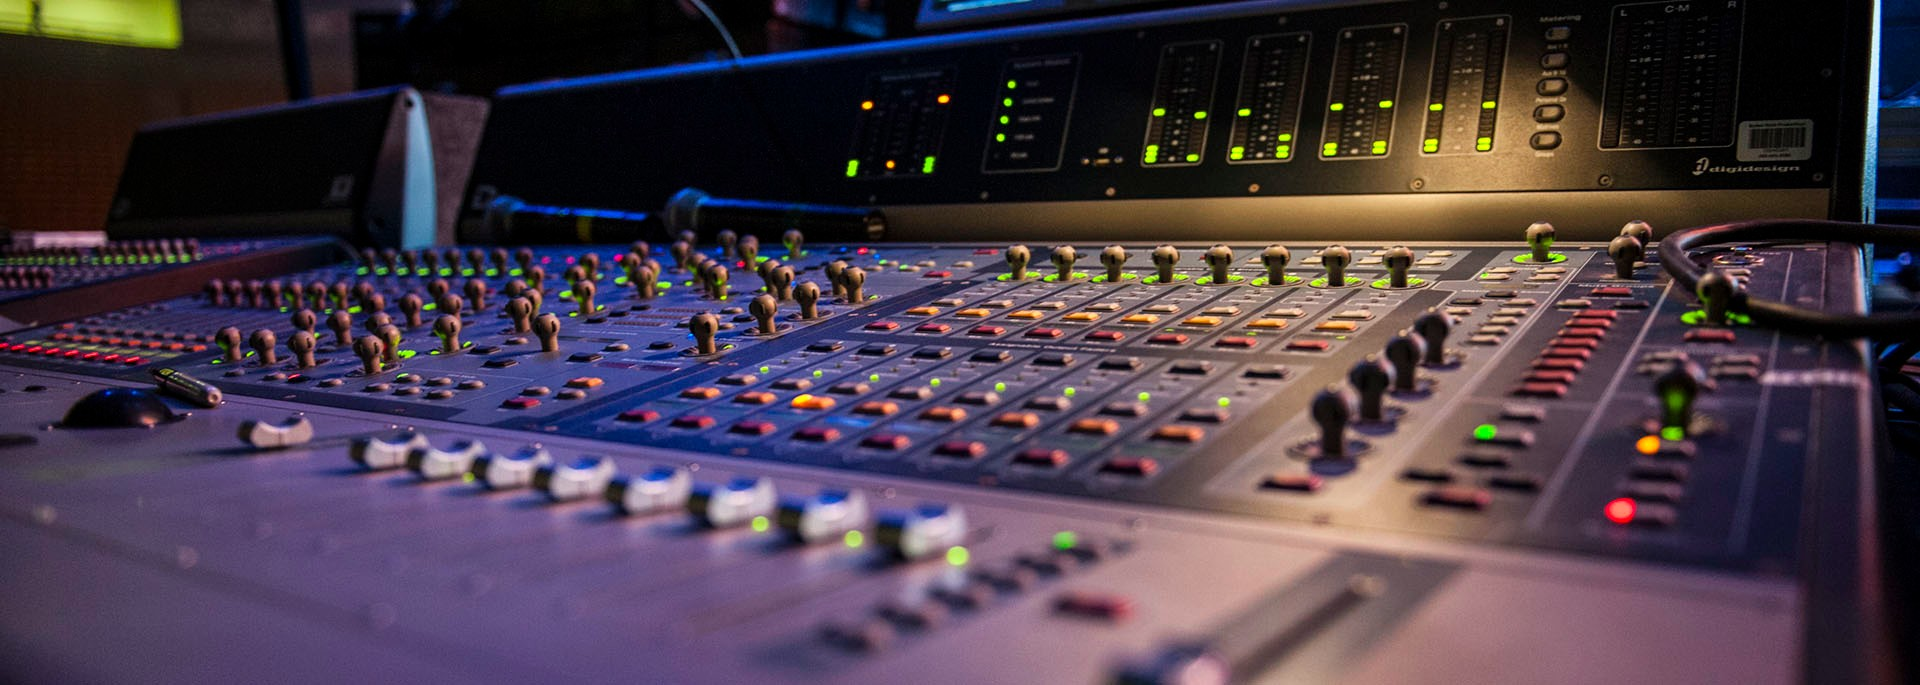 music-soundboard